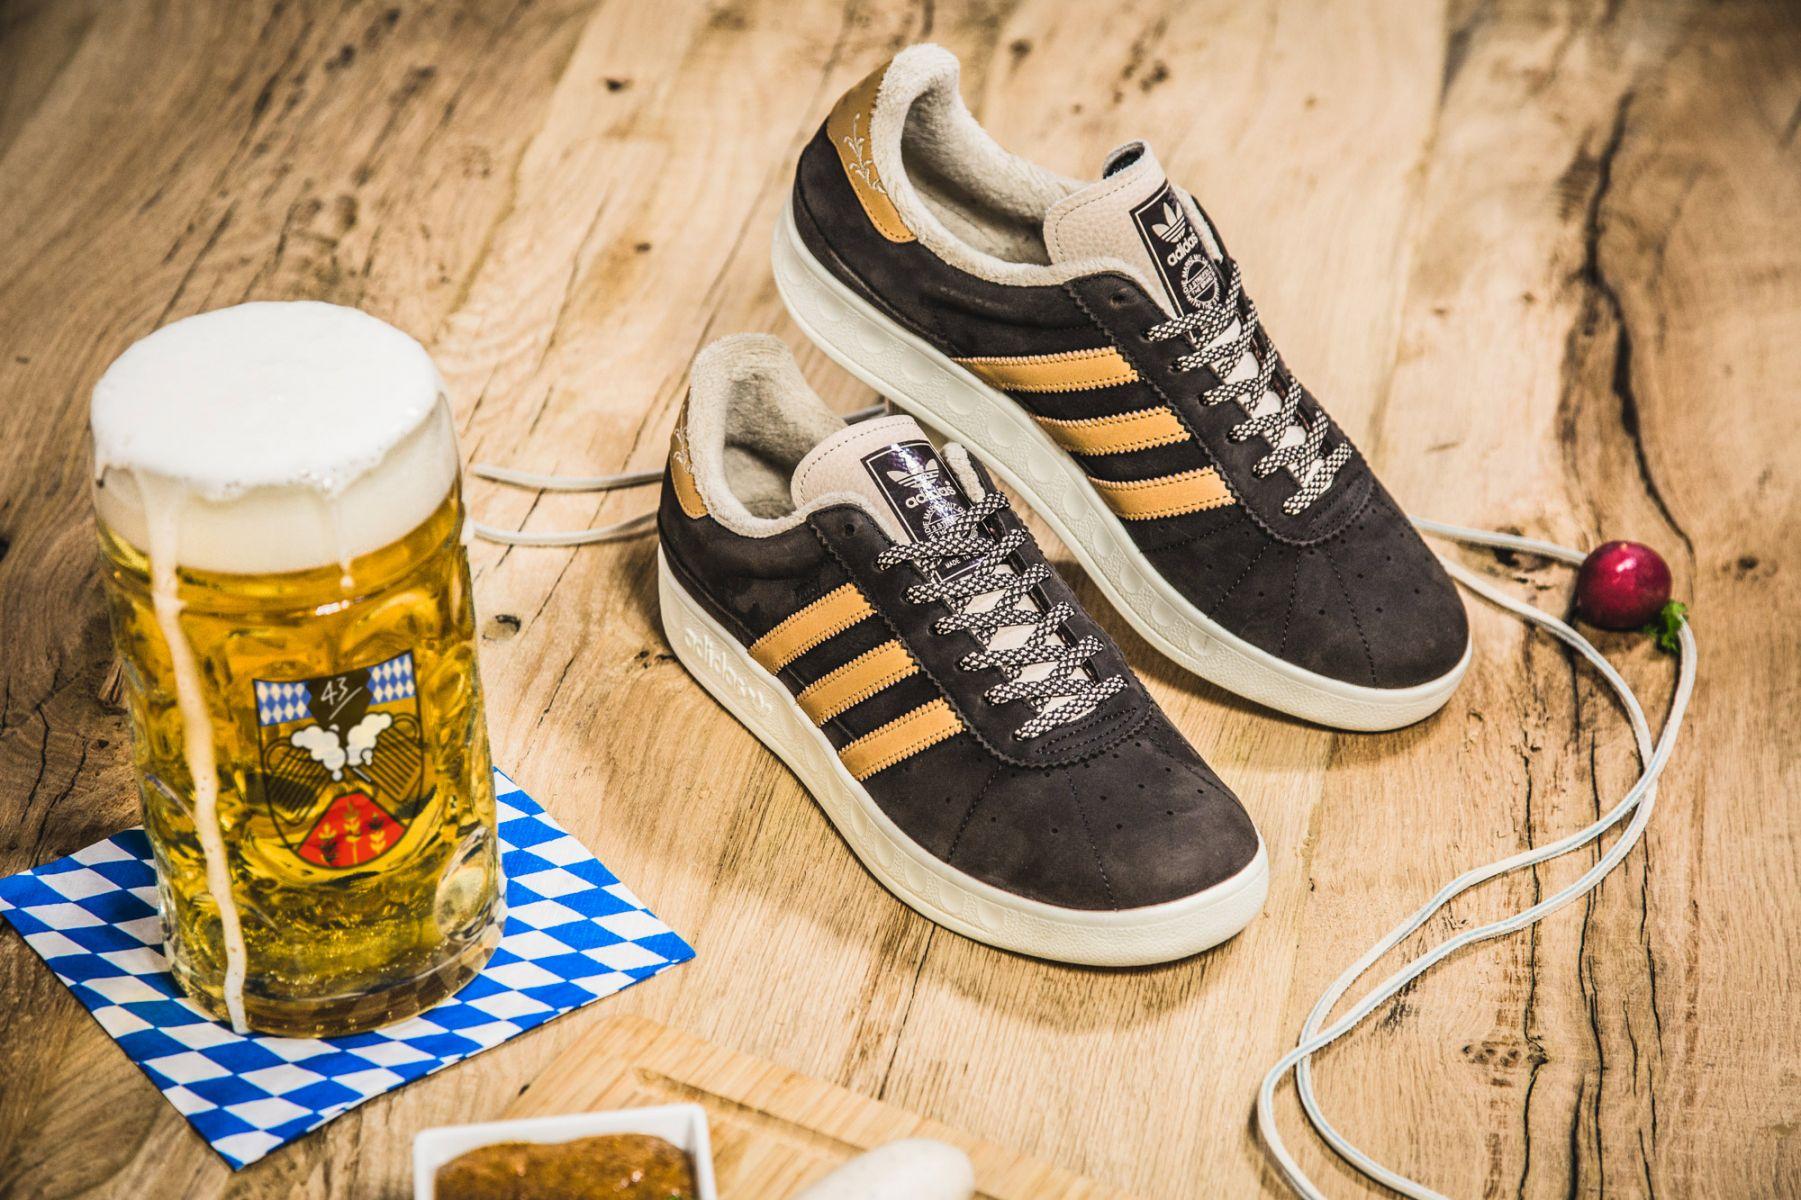 Adidas Munchen Oktoberfest